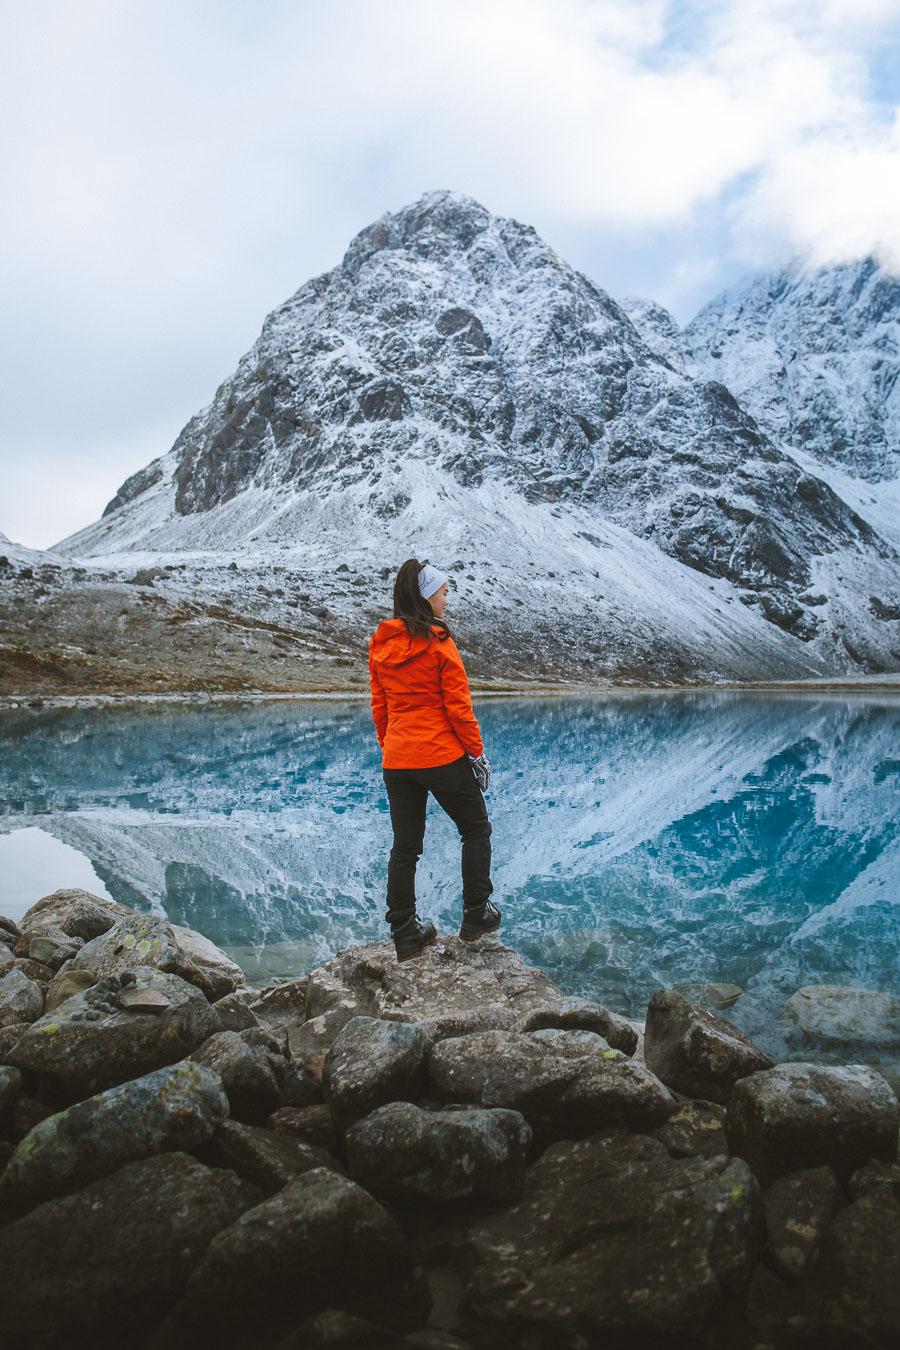 Girl in an orange jacket watching a mirrored lake